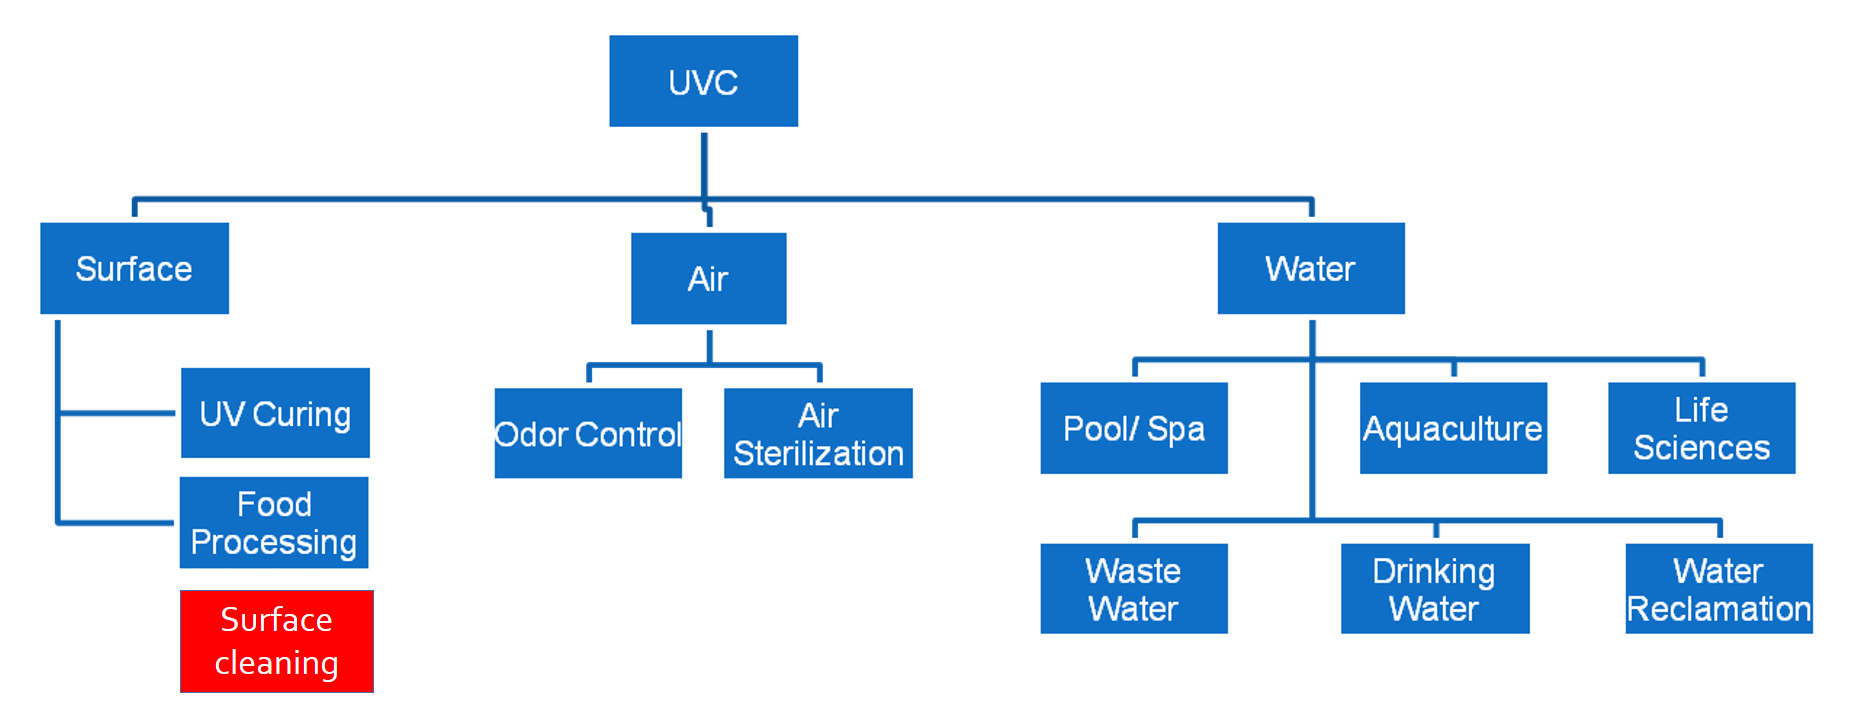 UVC downstream value chain